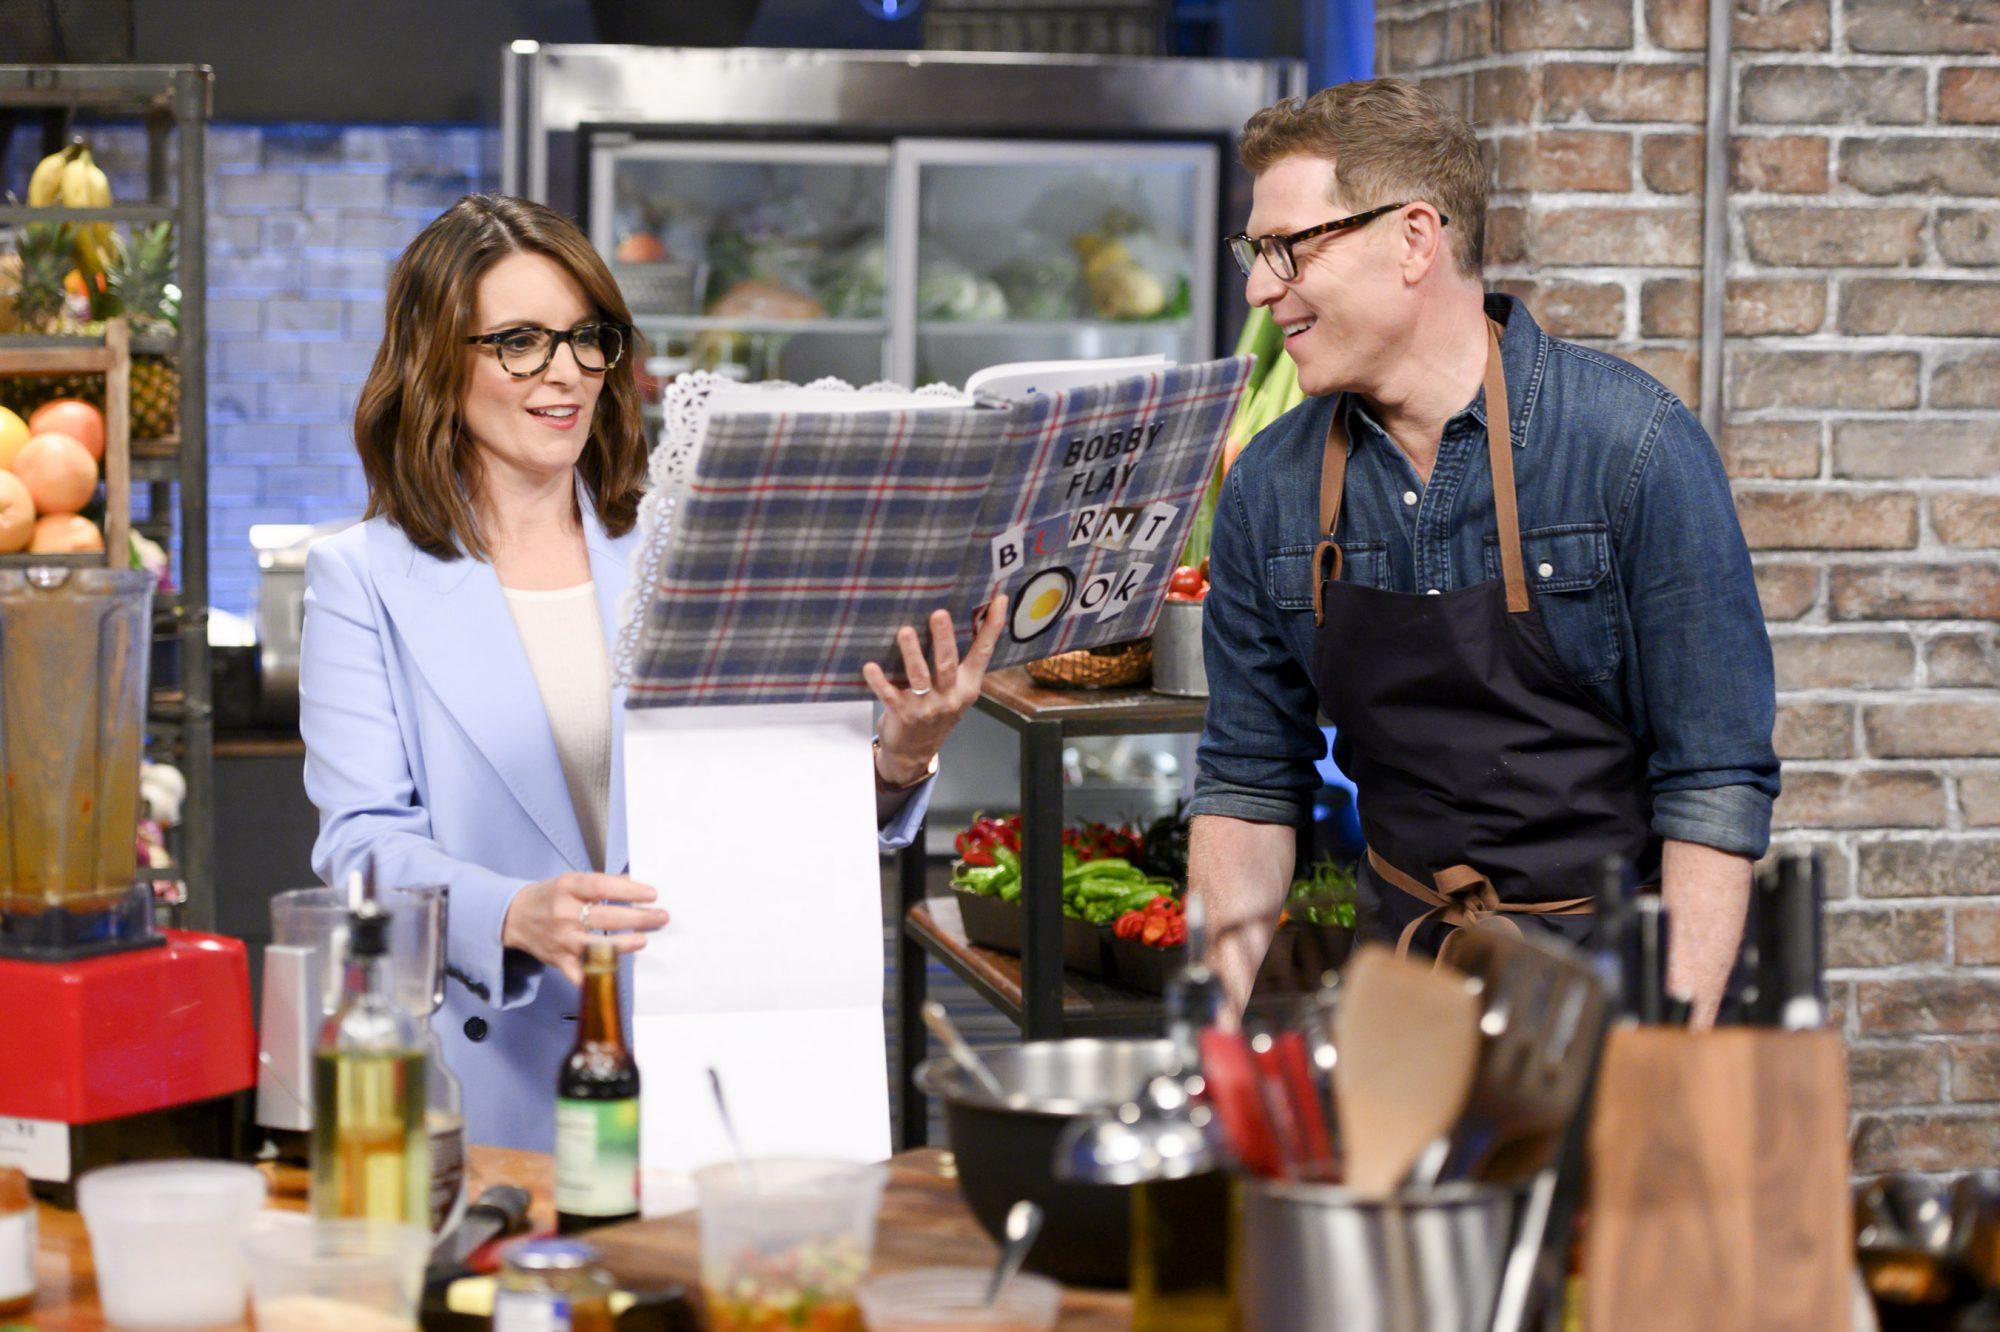 Co-host Tina Fey reads to host Bobby Flay from a burn book as he races to finish his lamb shawarma dish, as seen on Beat Bobby Flay, Season 25.